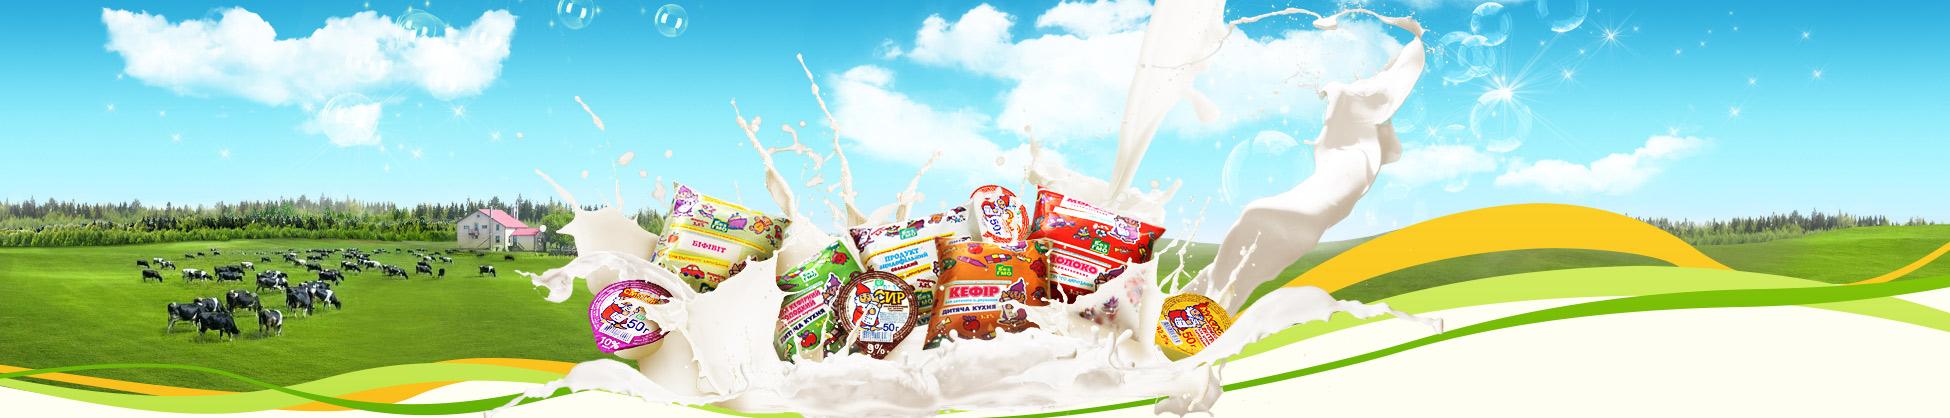 http://milkfactory.com.ua/img/top-index.jpg